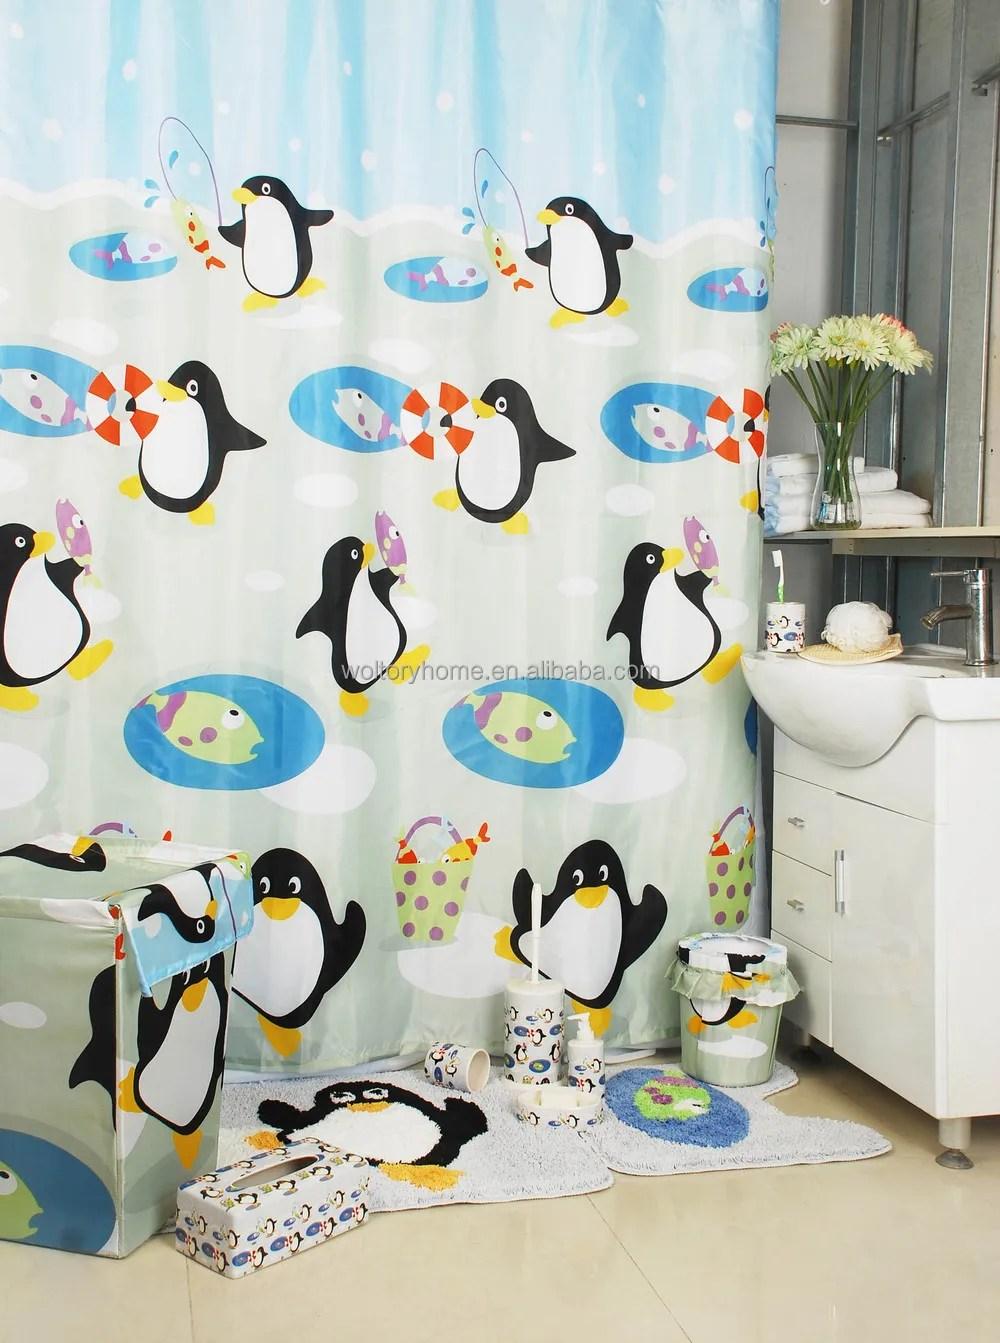 bathroom products bath set penguin bathroom set shower curtain with bath rug sets buy bathroom products bath set penguin bathroom set shower curtain